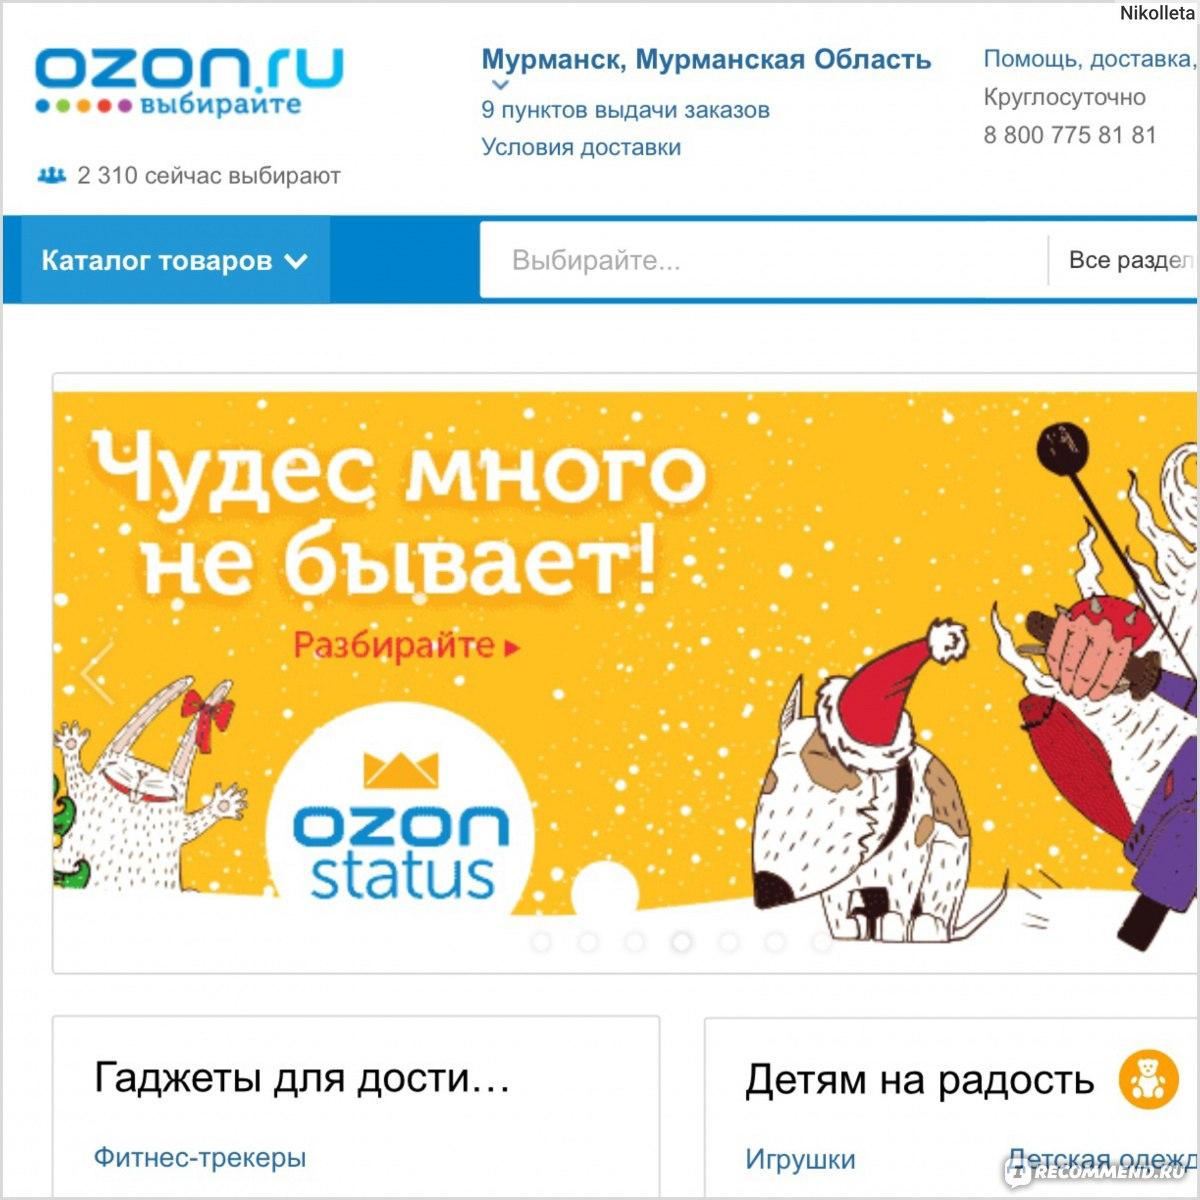 Ozon.ru» - интернет-магазин - «Самый НЕОДНОЗНАЧНЫЙ интернет-магазин ... a399f87551b